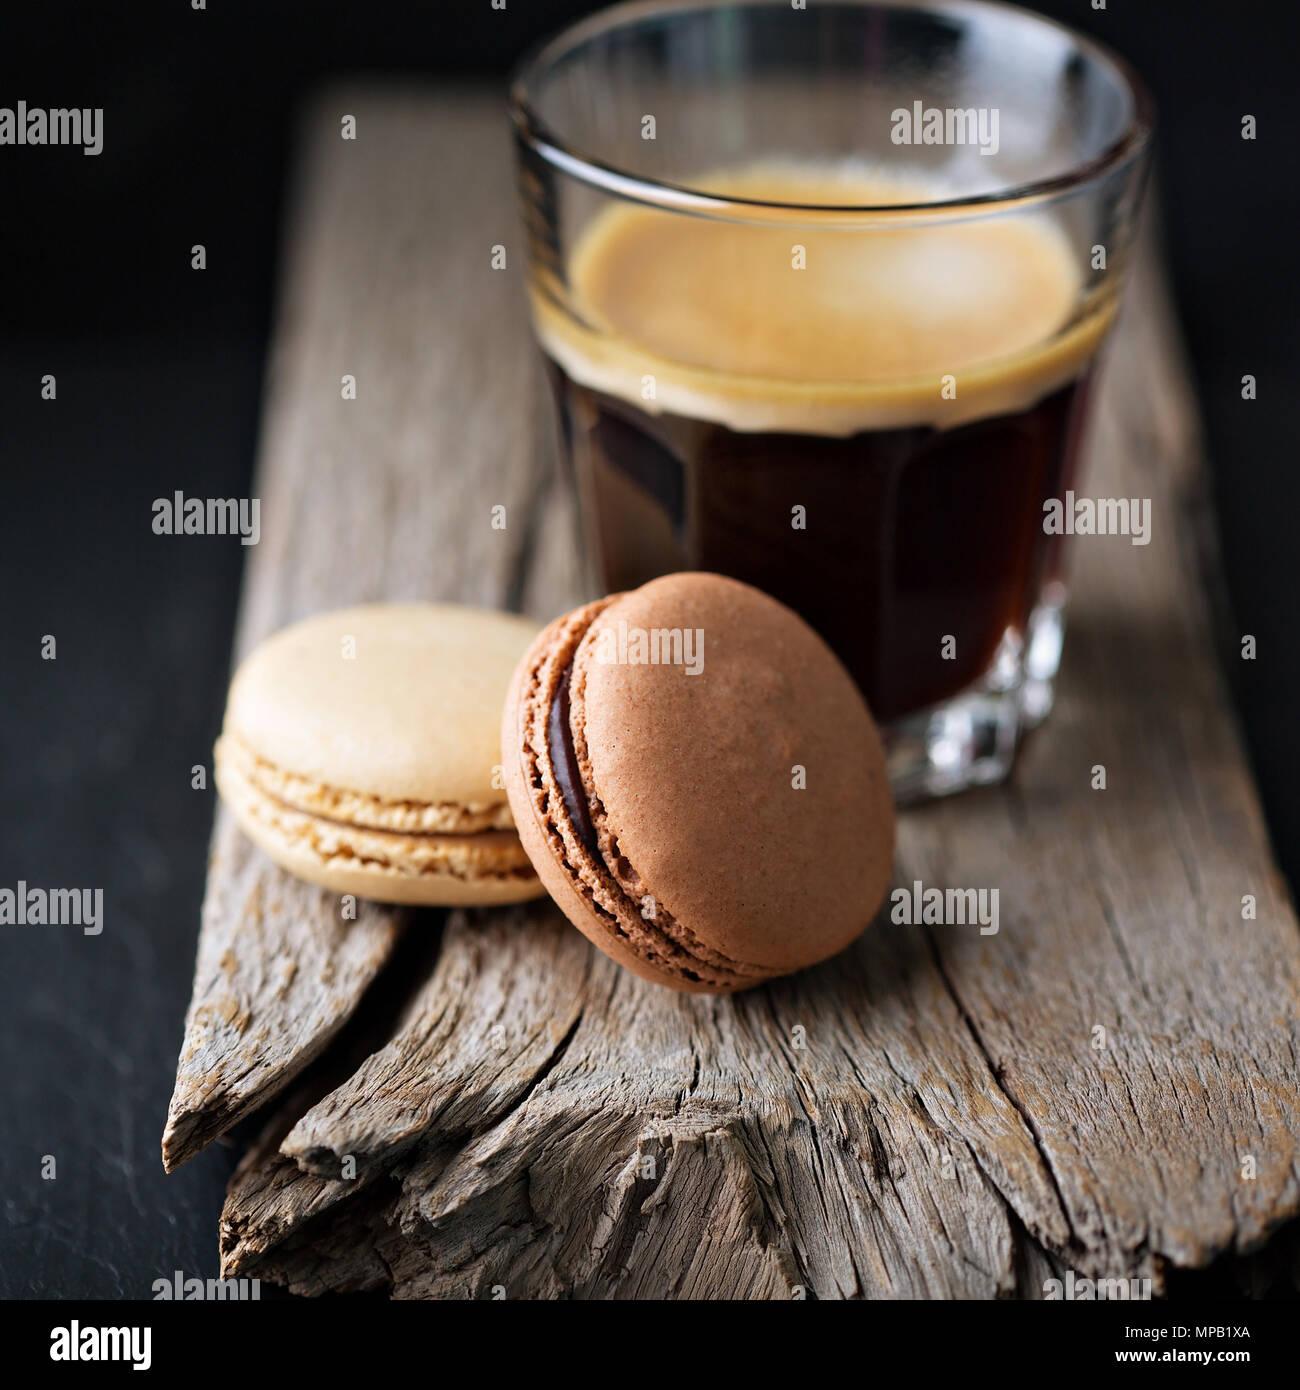 Macarons de chocolate y café Imagen De Stock